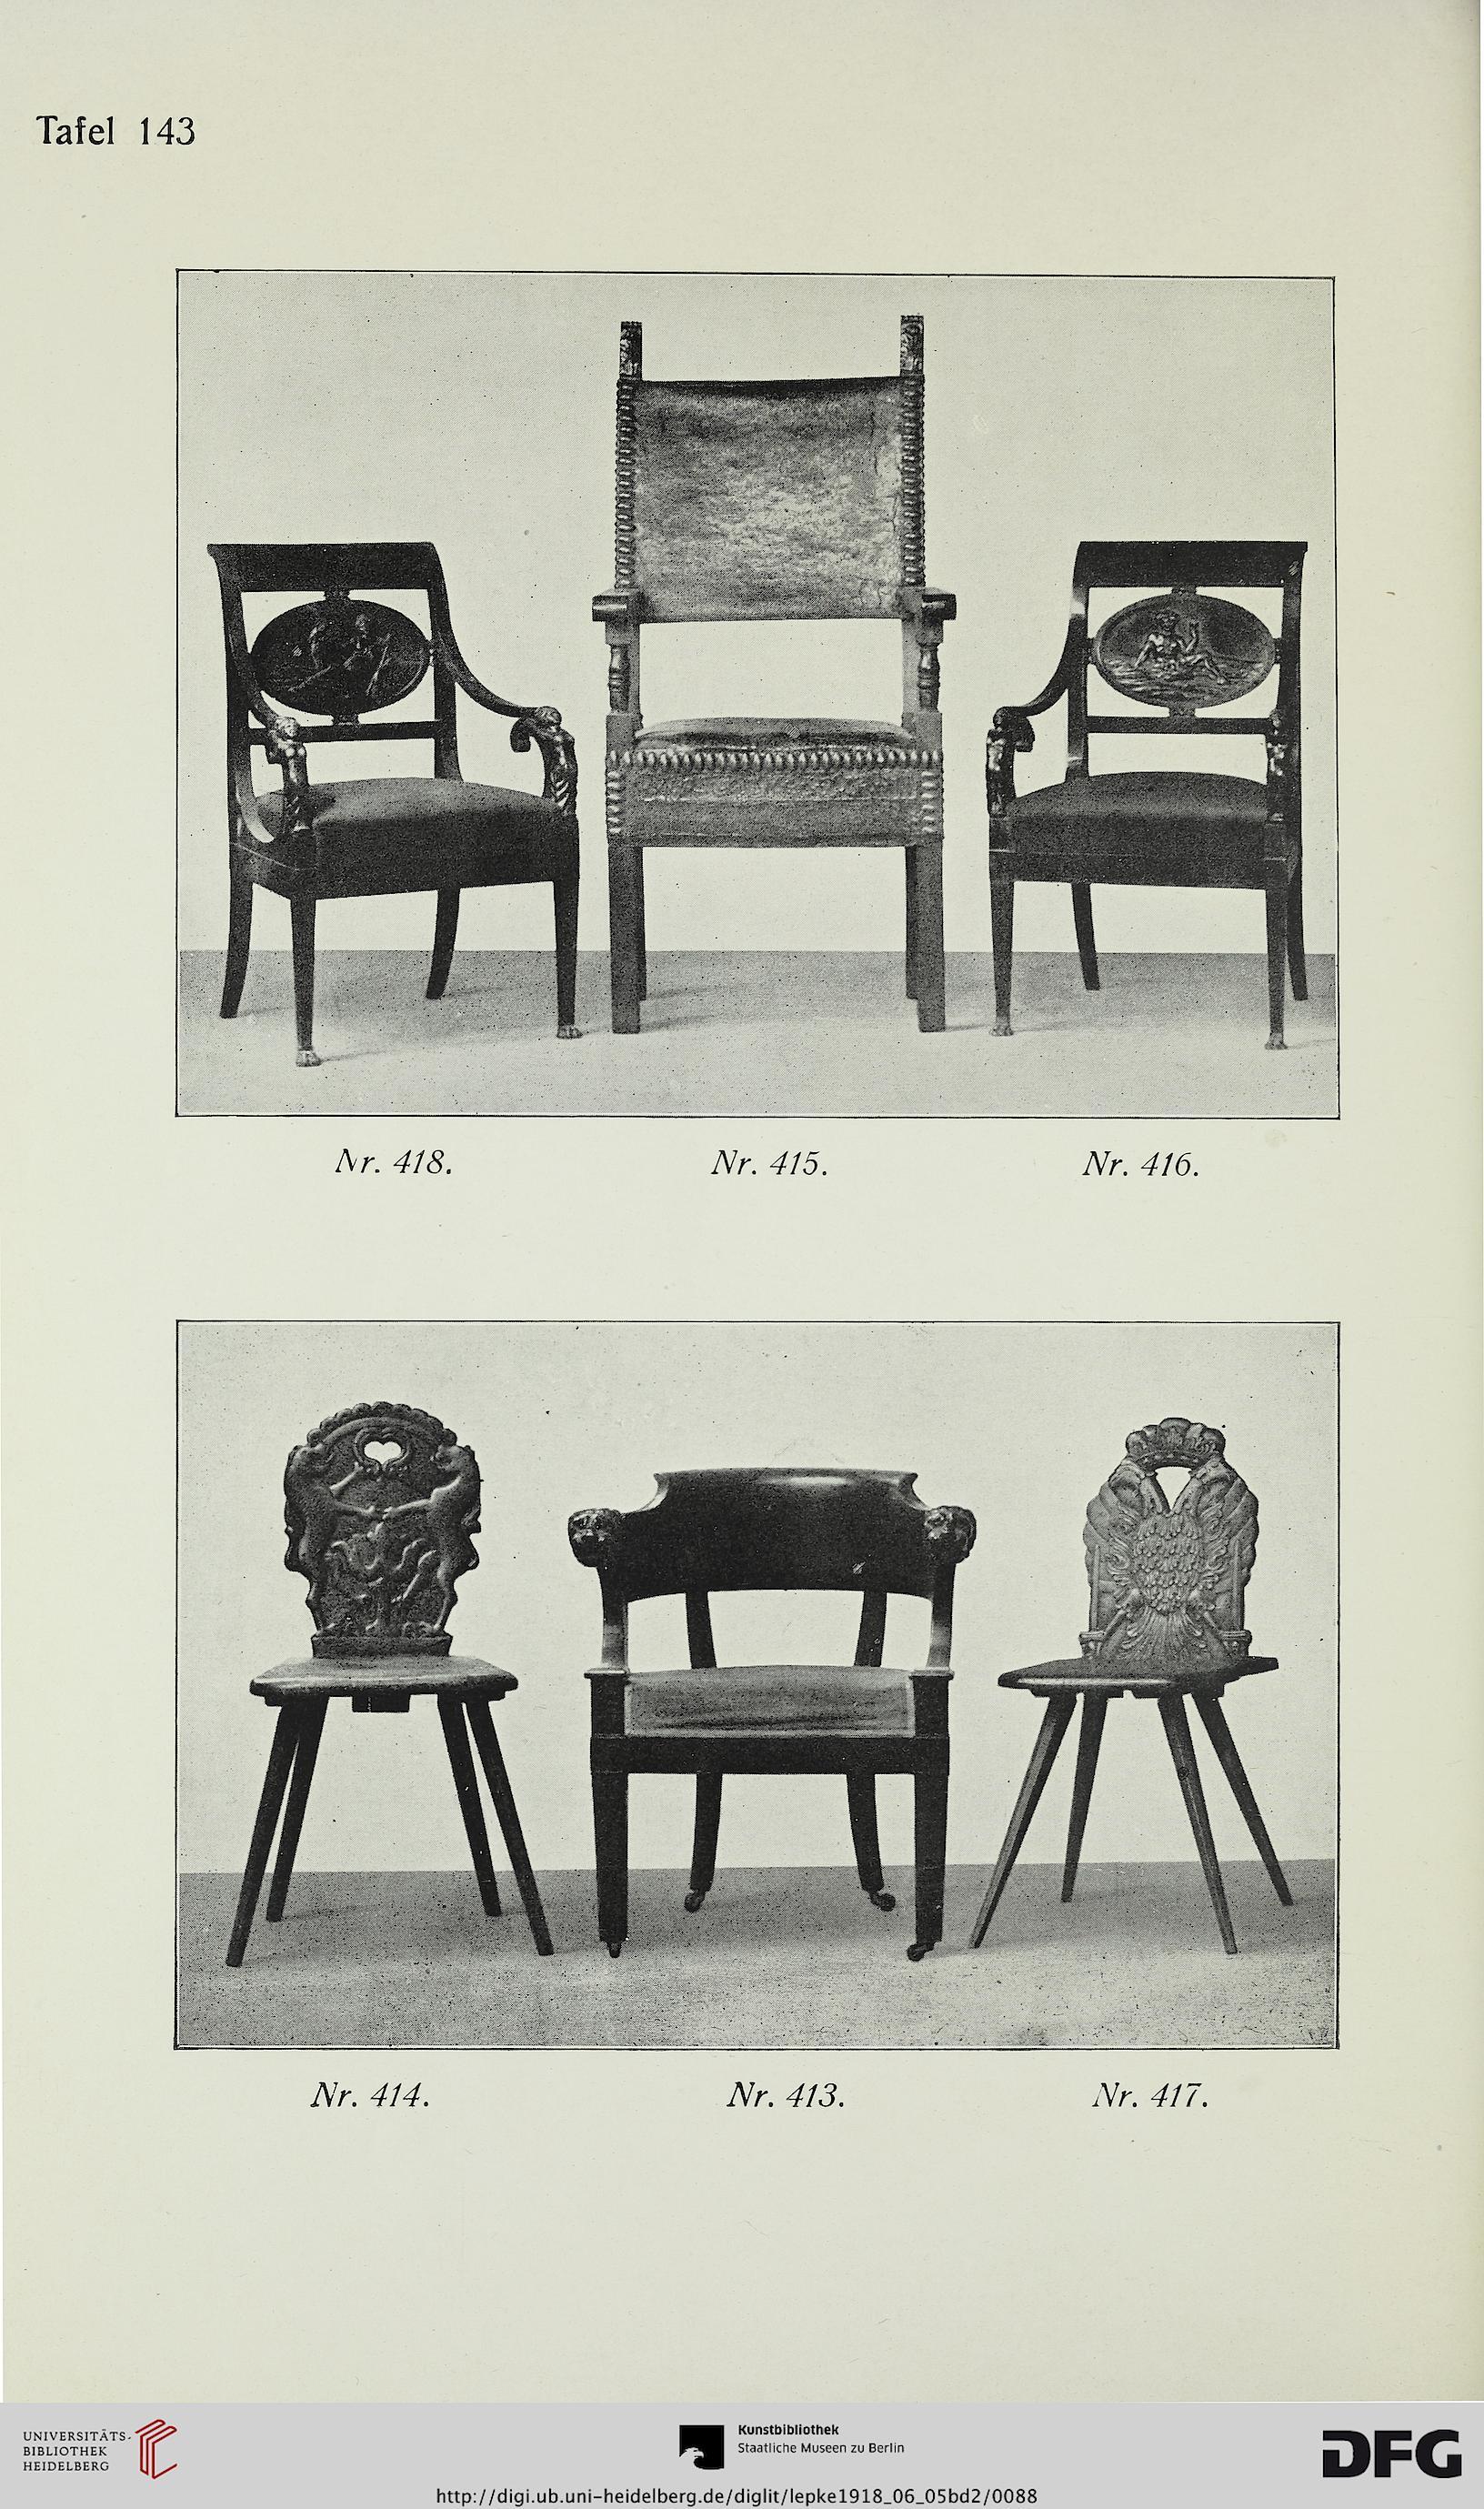 rudolph lepke 39 s kunst auctions haus hrsg nachlass. Black Bedroom Furniture Sets. Home Design Ideas